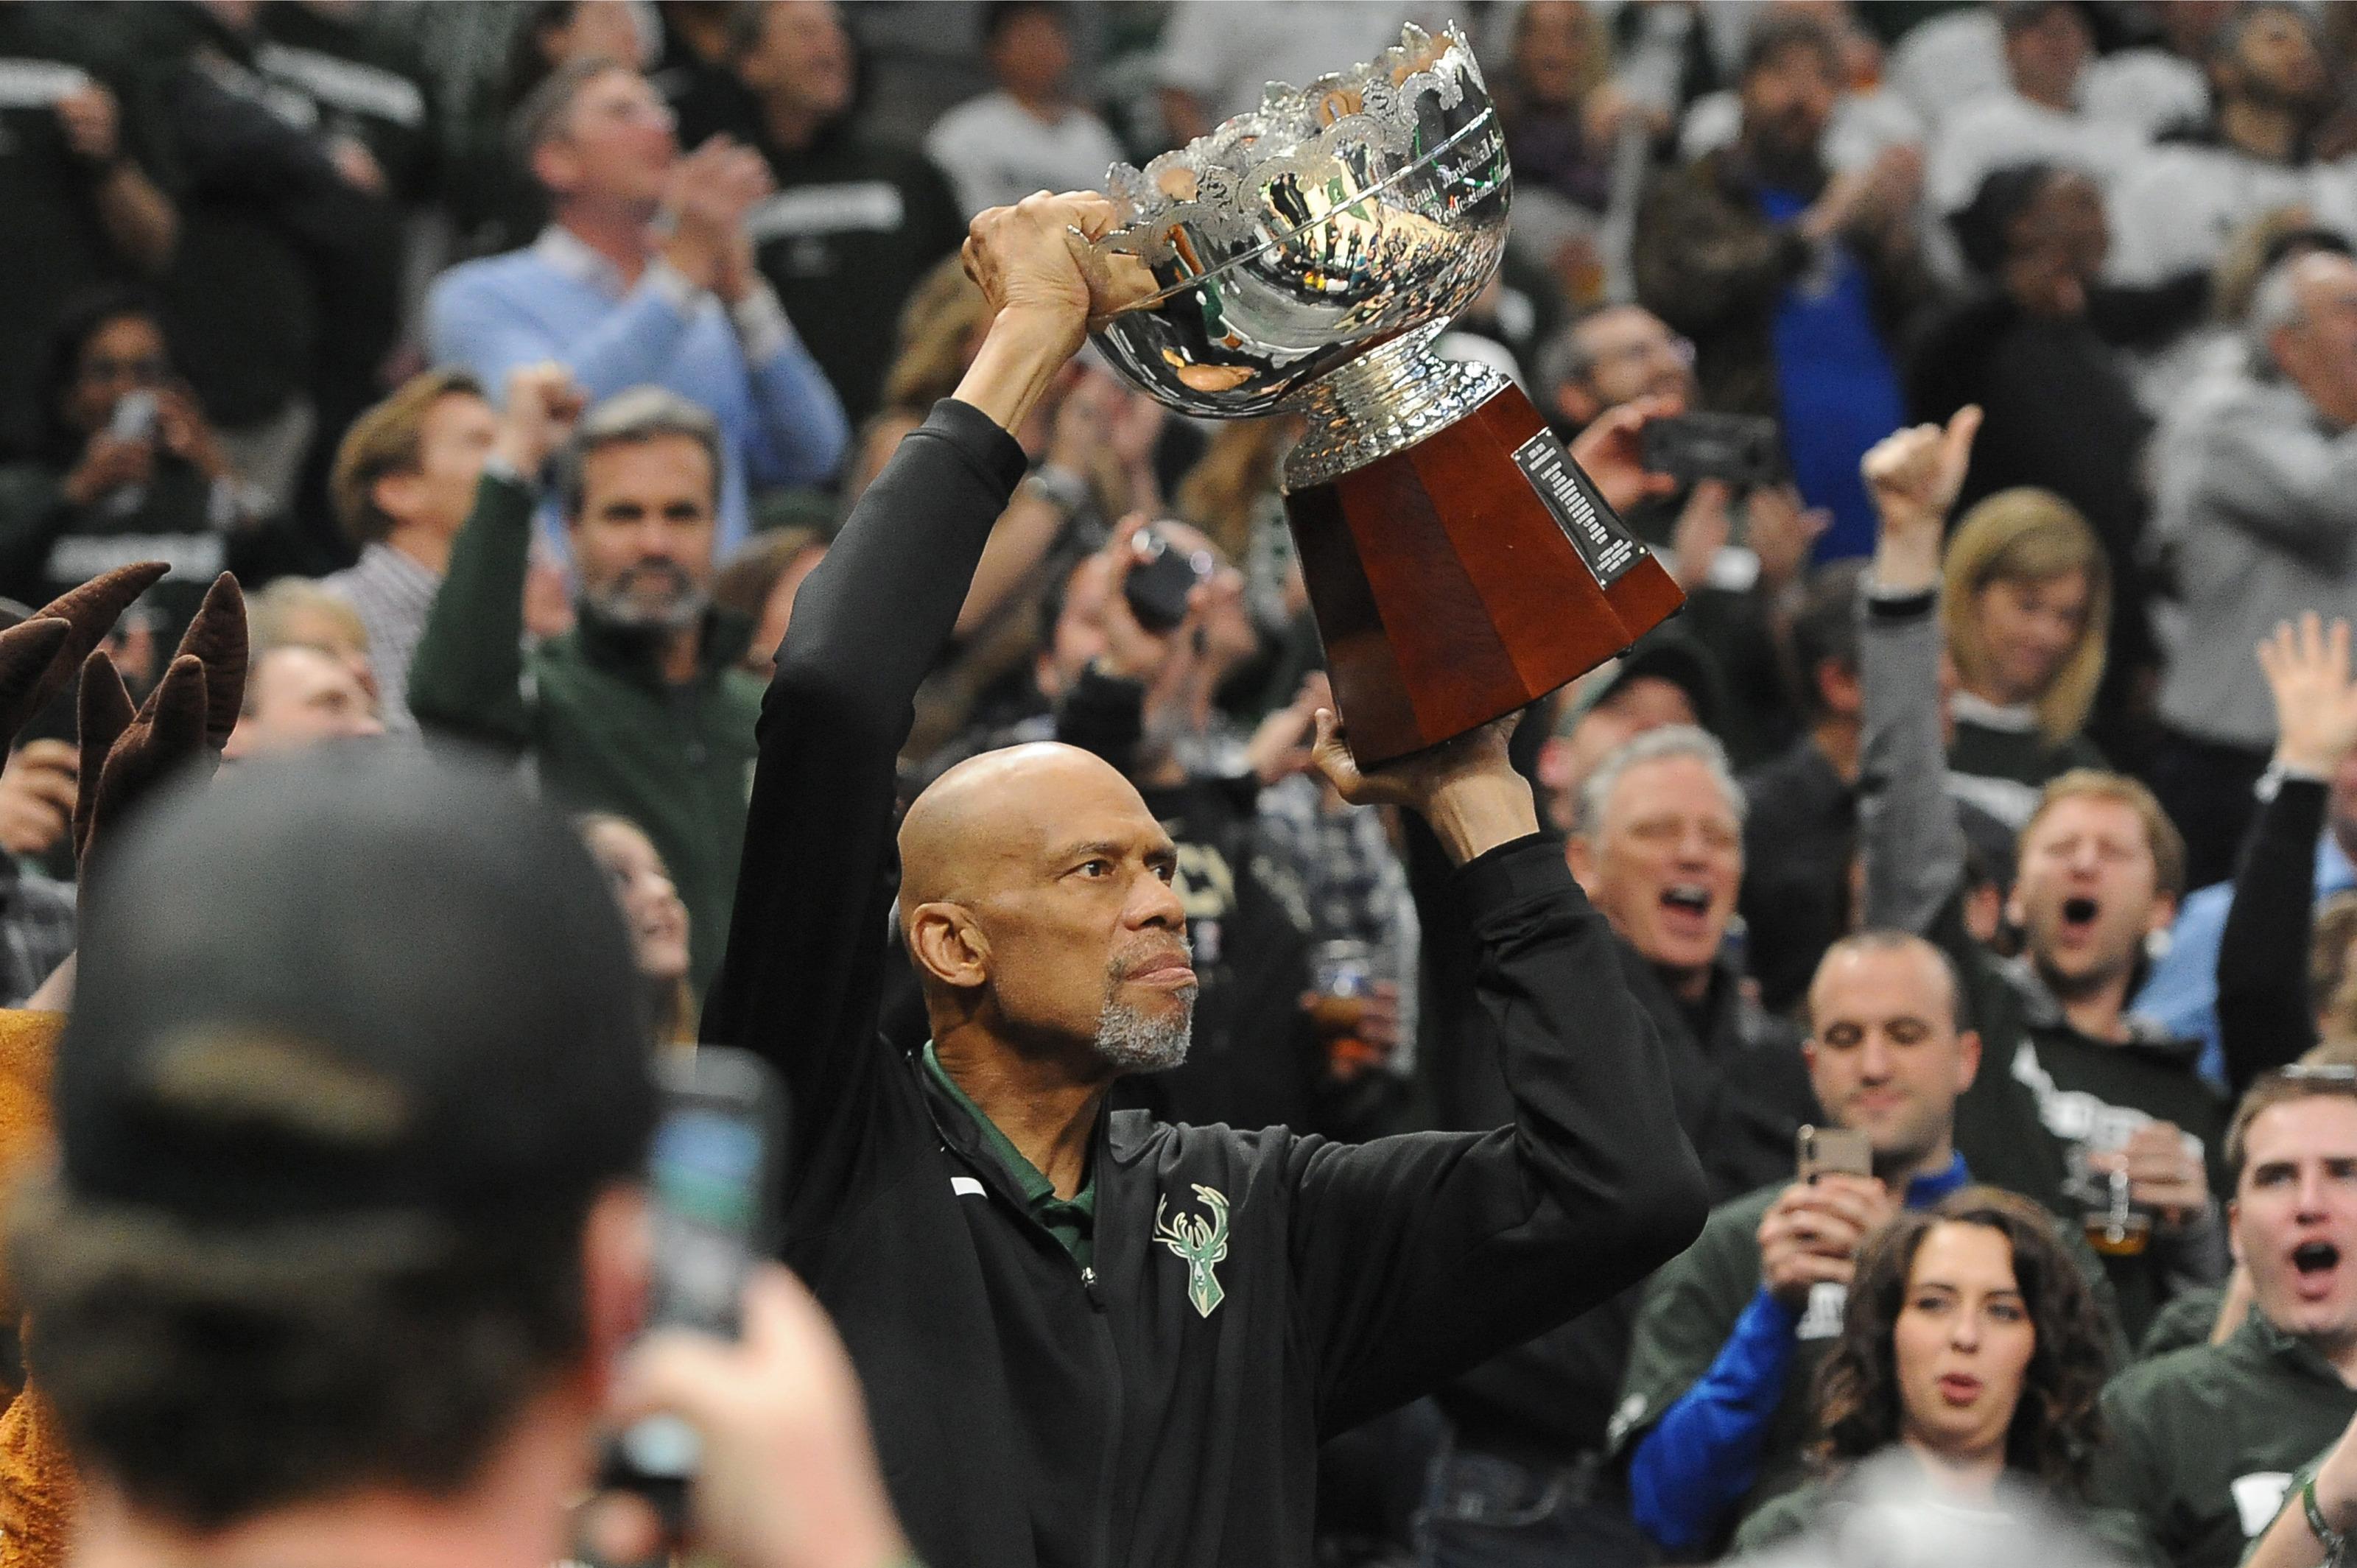 Milwaukee Bucks: Celebrating 50th anniversary of winning NBA title